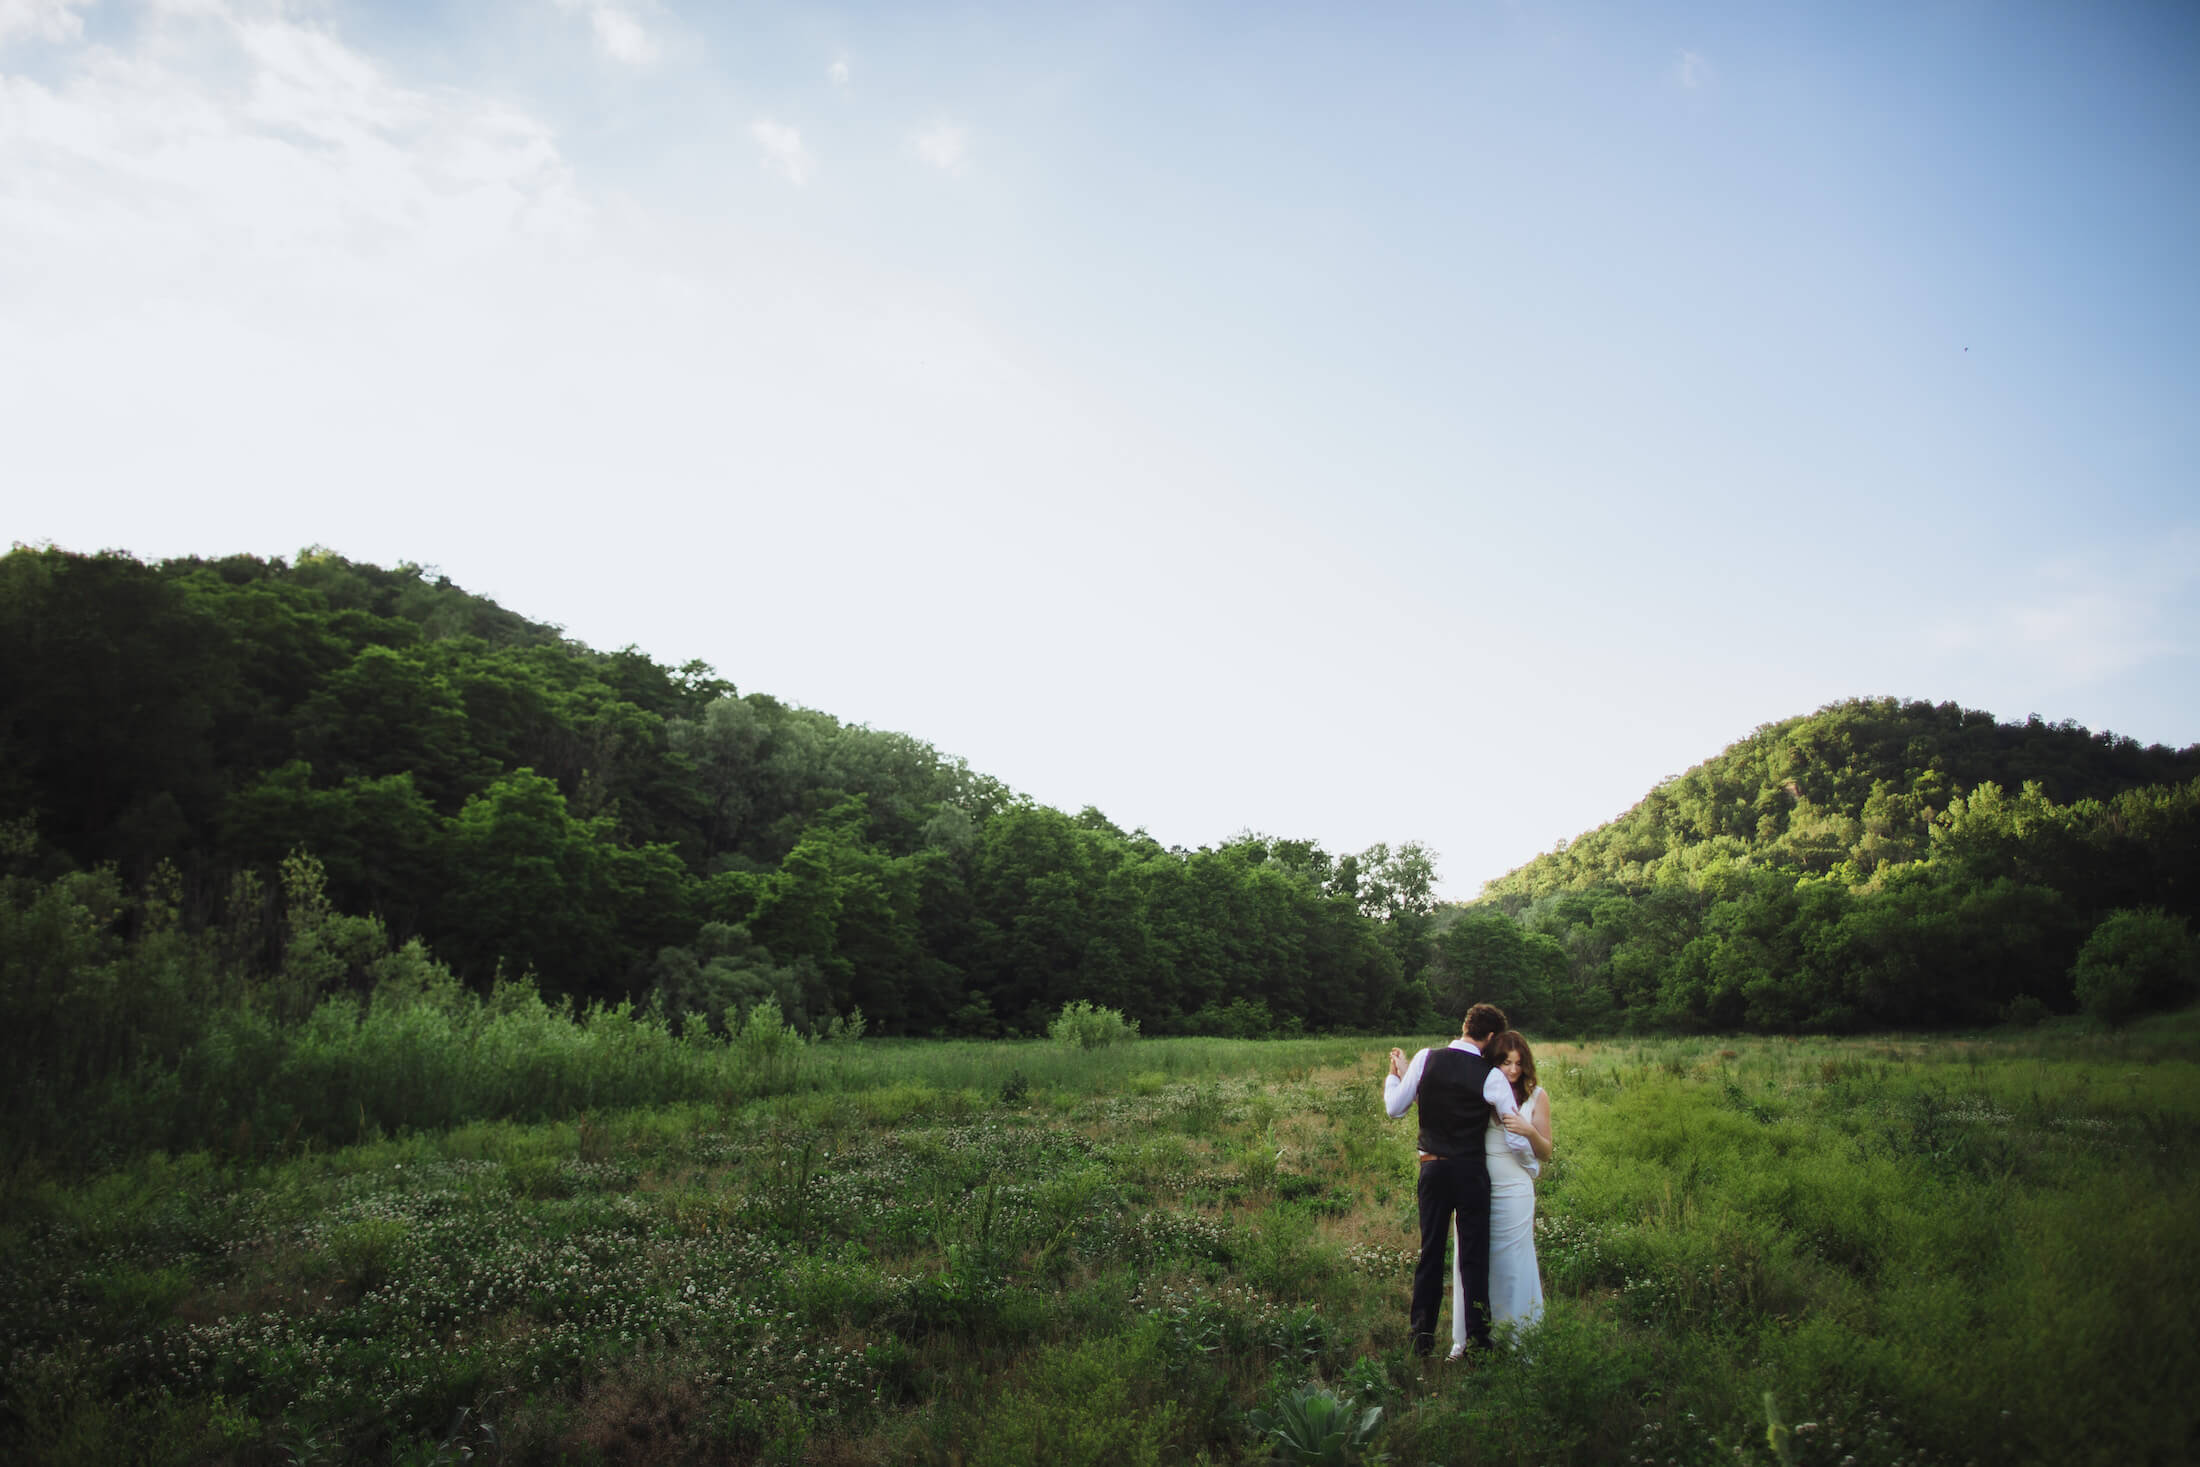 engle-olson-ray-kelly-photography-wisconsin-wedding-112.jpg